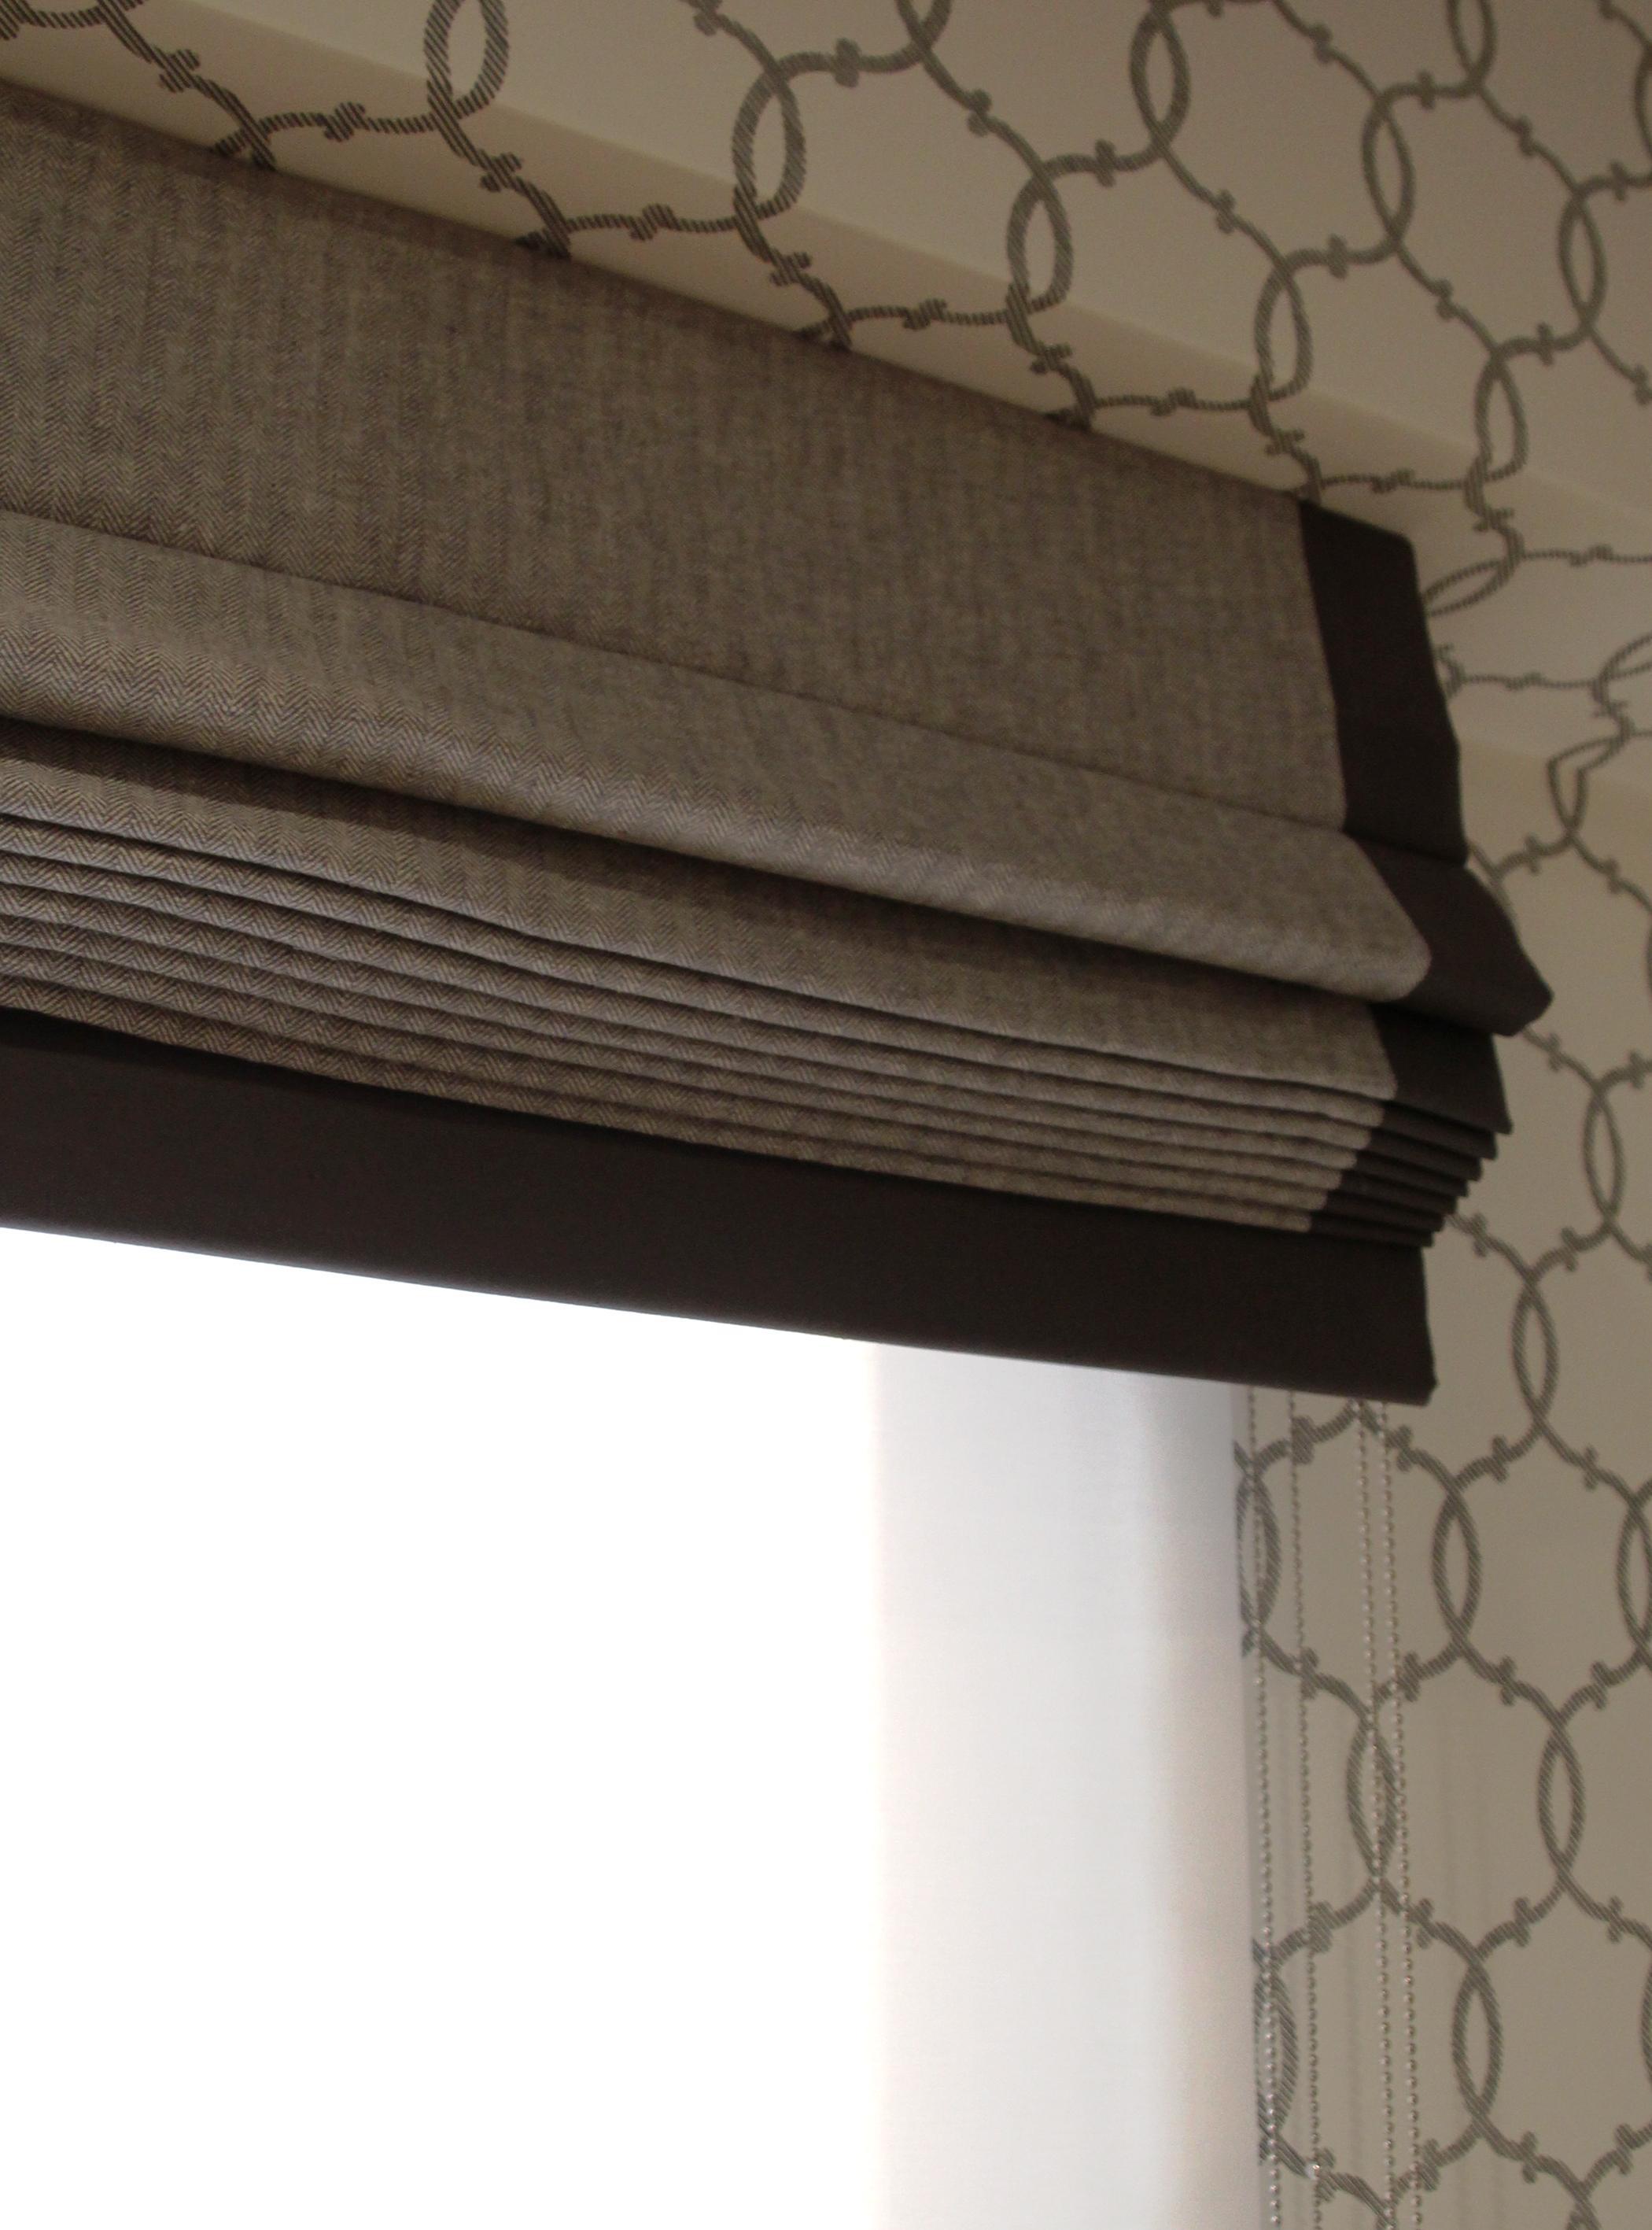 20161117-closet08-shades-detail